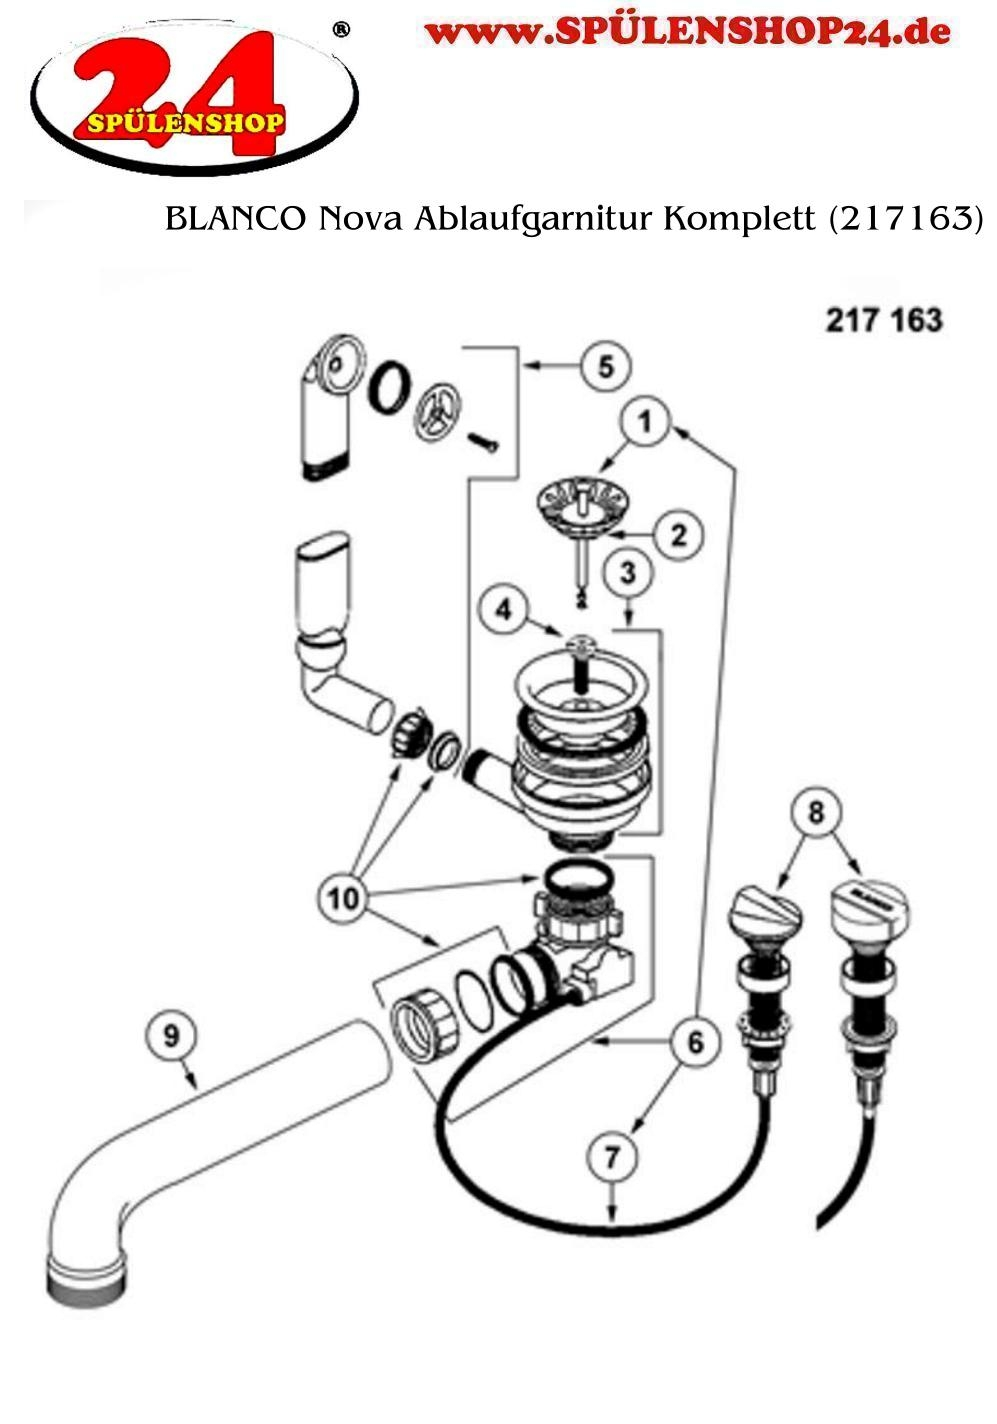 Blanco Nova Ablaufgarnitur Komplett 217163 Gunstig